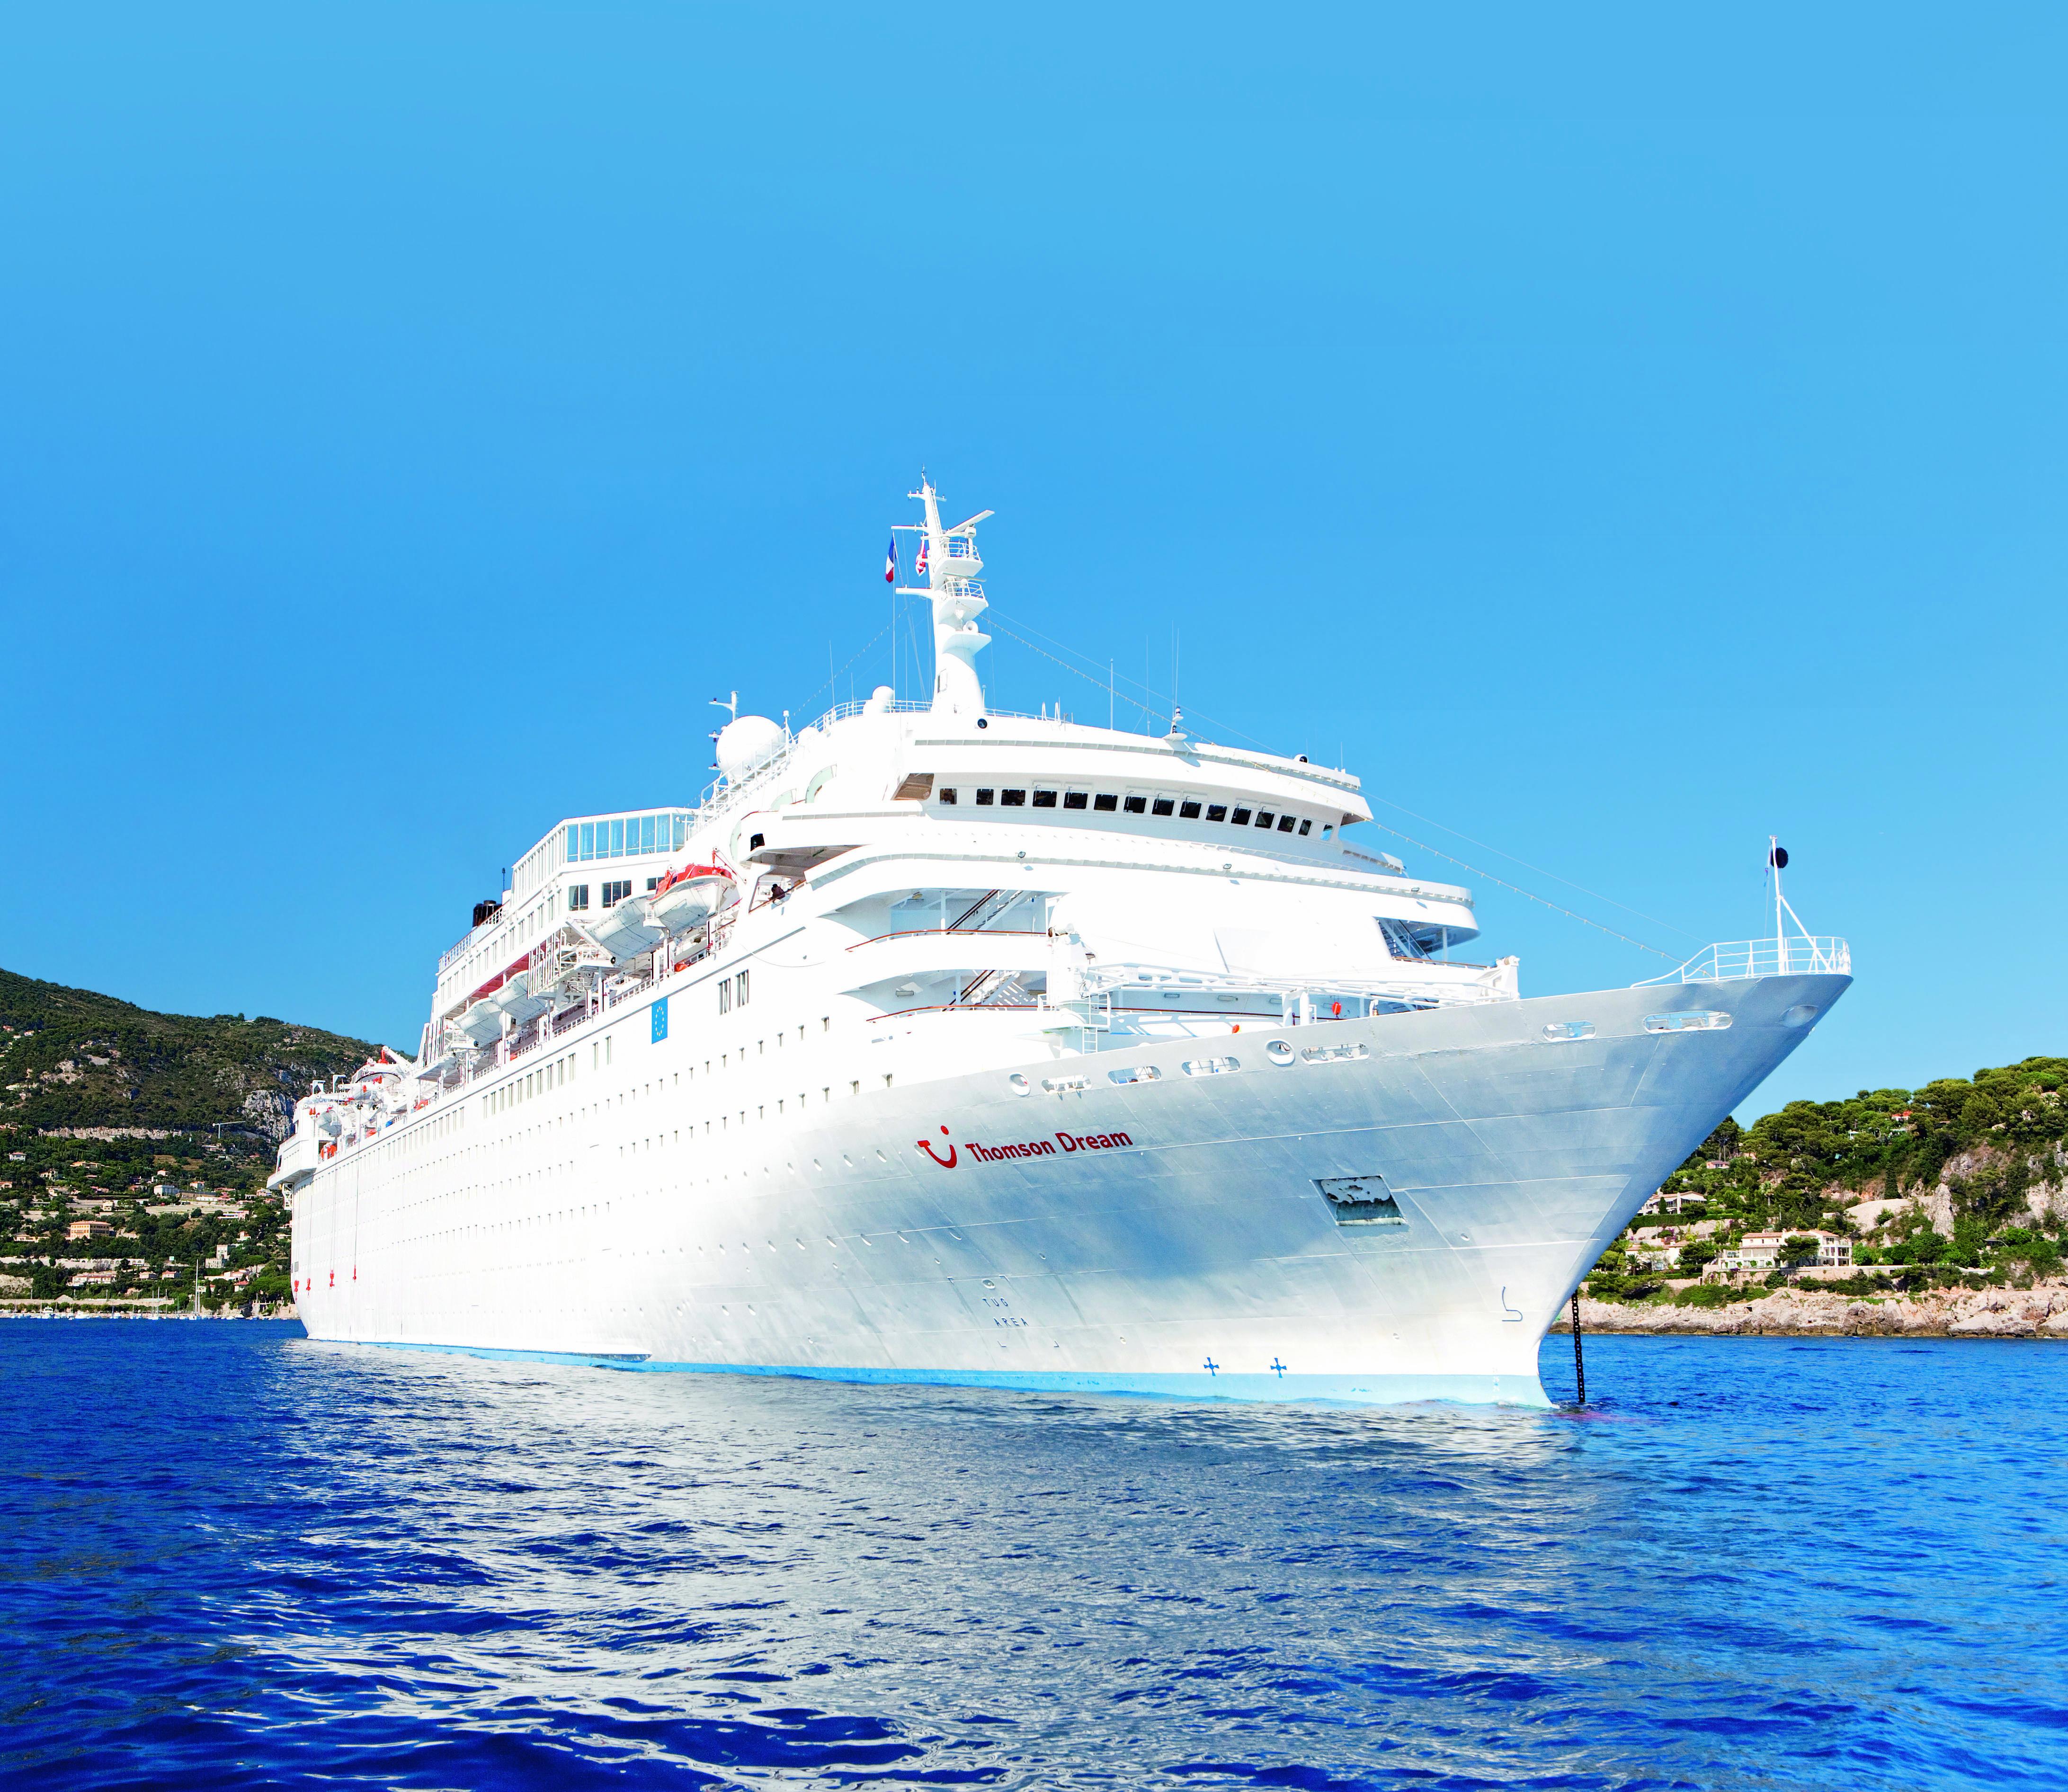 Marella Cruises Marella Dream Cruise Ship Reviews UPDATED - Thomson dream cruise ship latest news